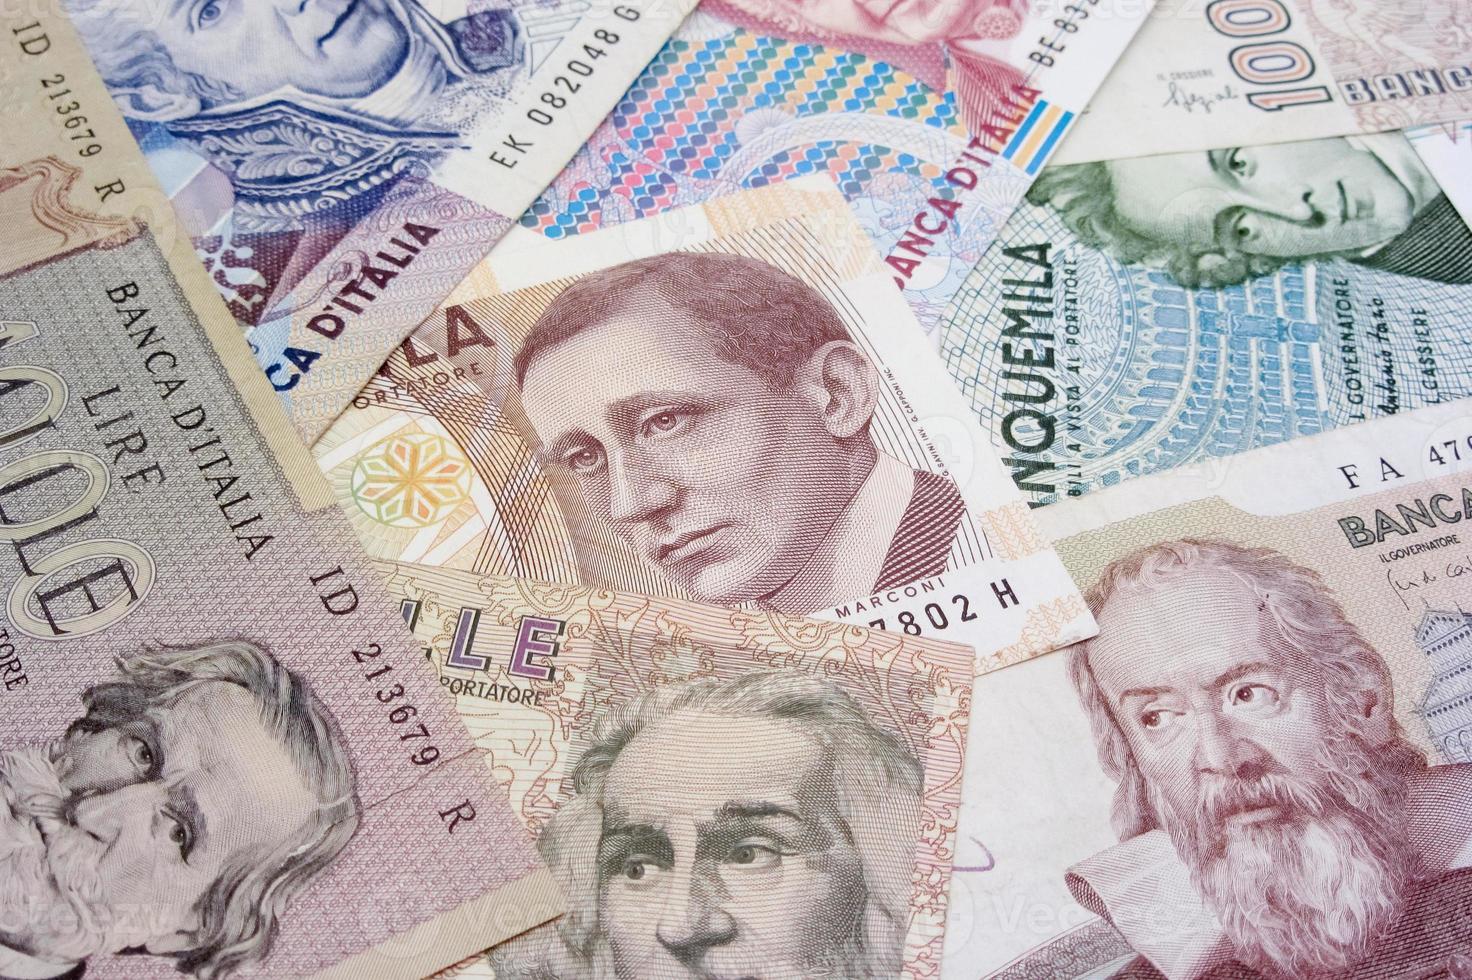 Italian old bills photo